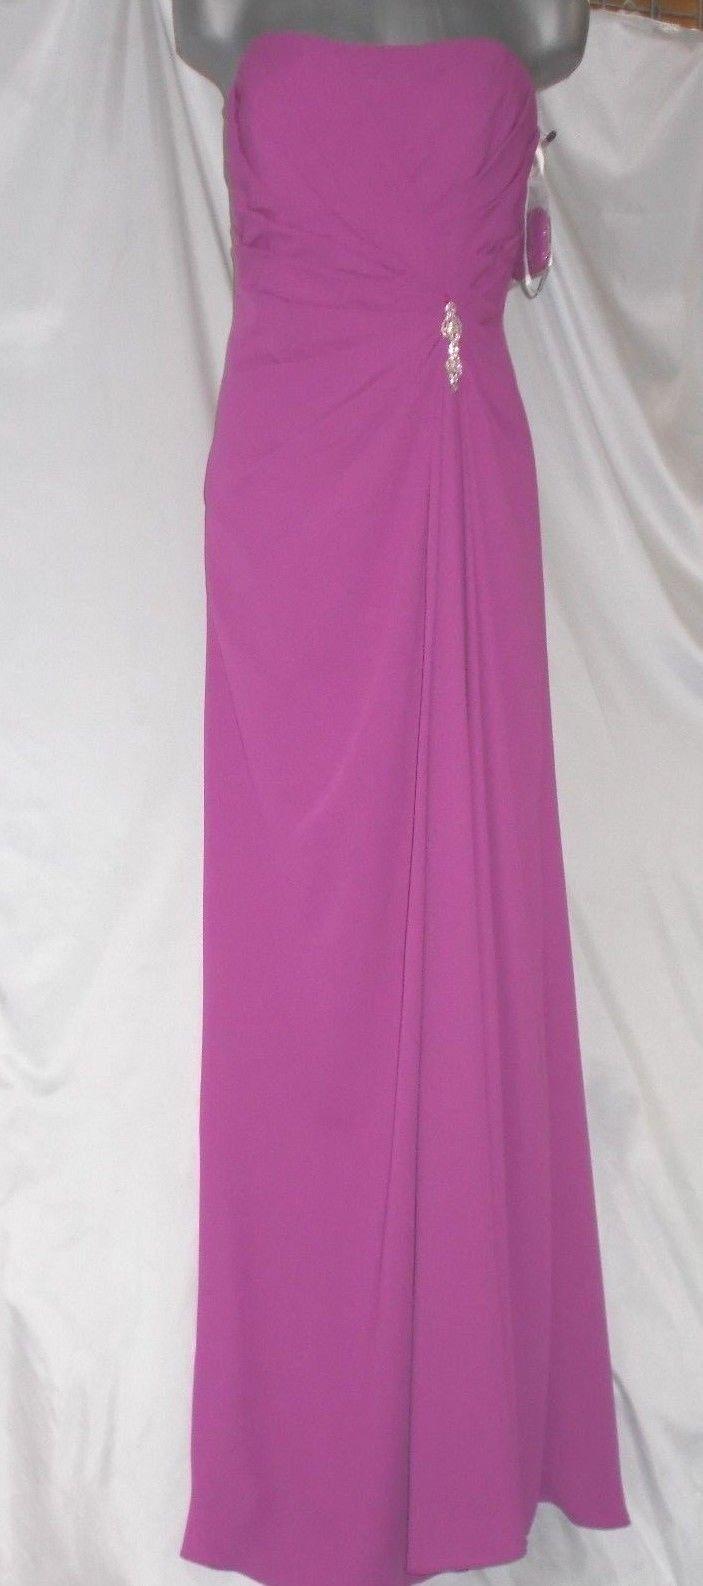 David's Bridal Size 10 Purple Plum Long Dress Evening Party Prom New